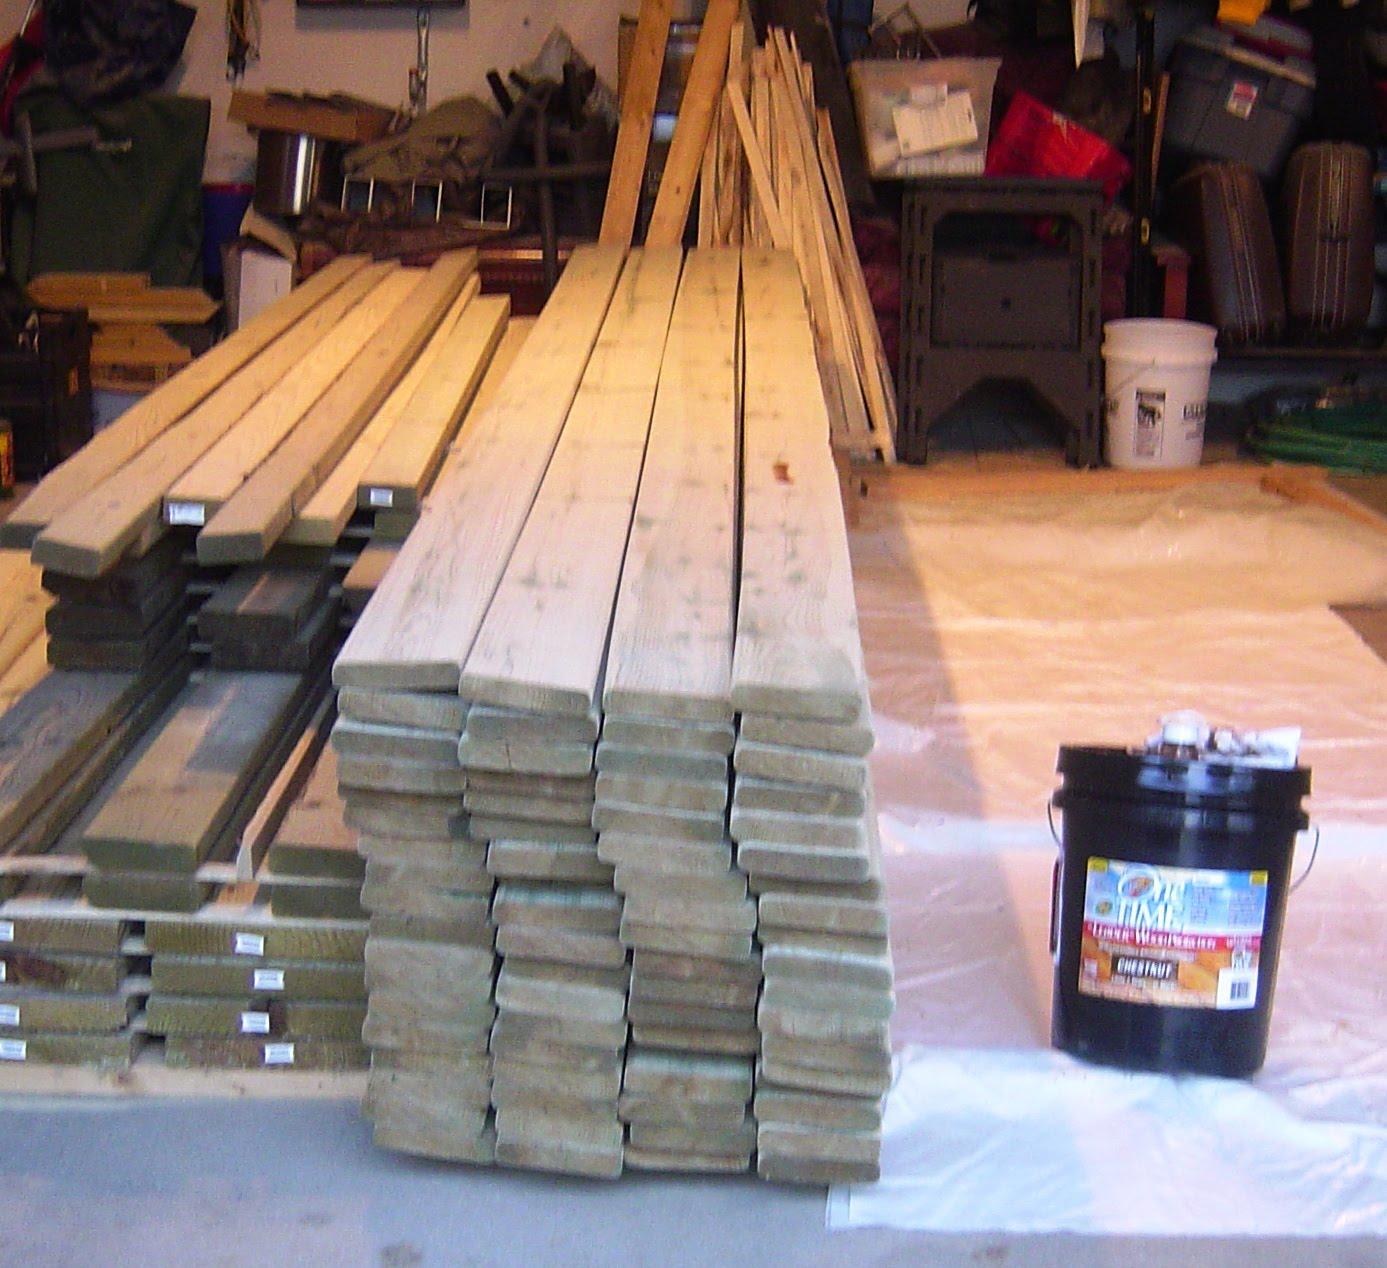 [precoating_one_time+_wood_protector.JPG]